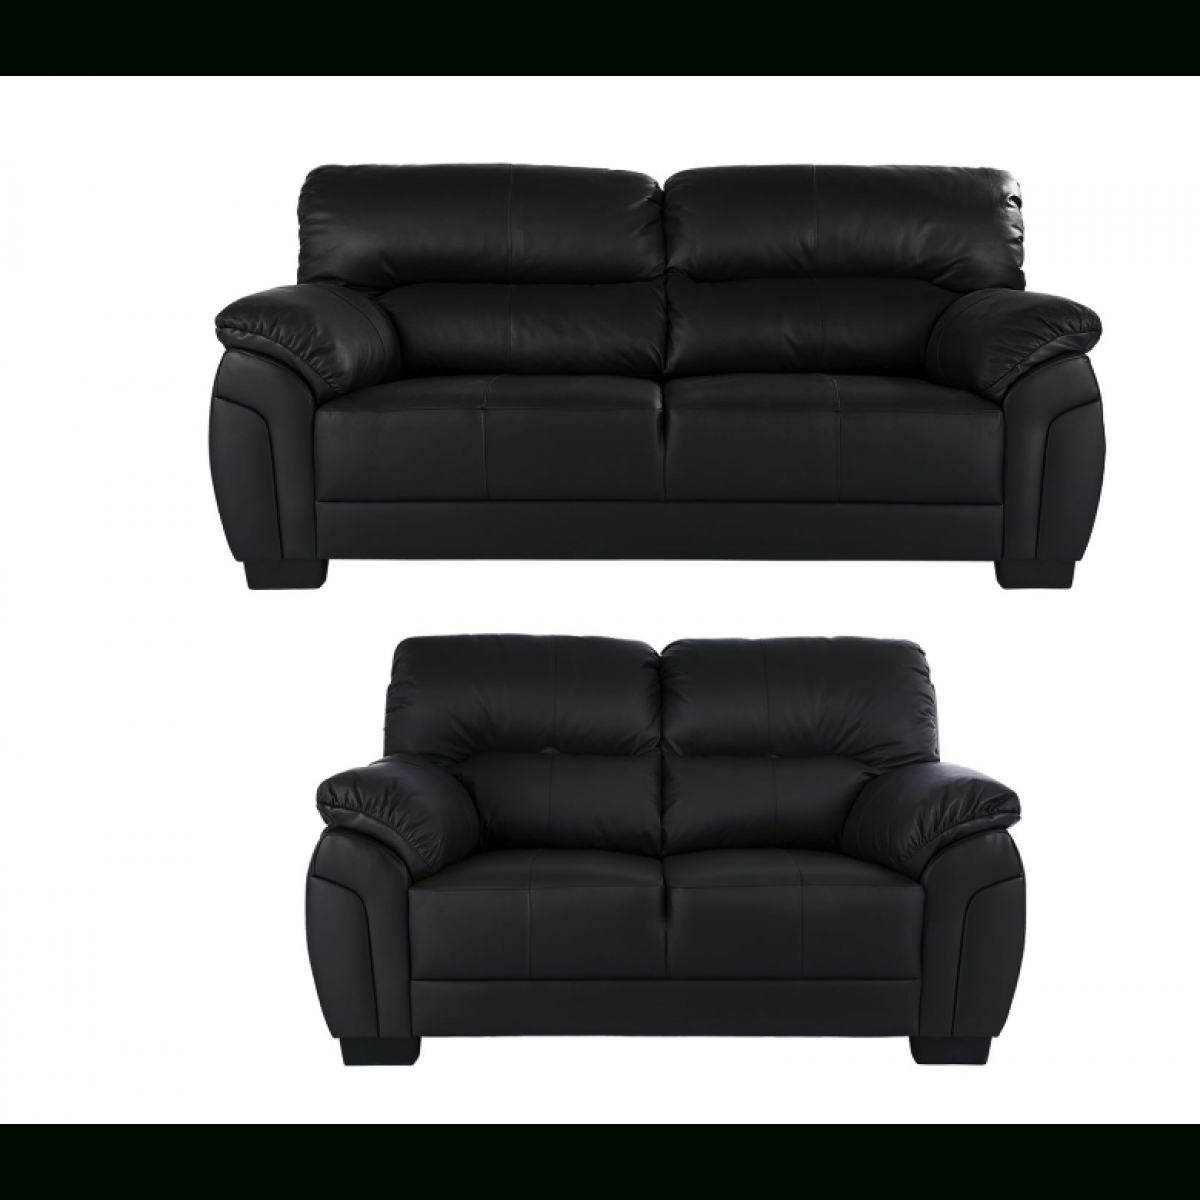 Ancona 3 Seater Plus 2 Seater Sofa Set Black – Furnico Village Regarding Black 2 Seater Sofas (Image 4 of 20)